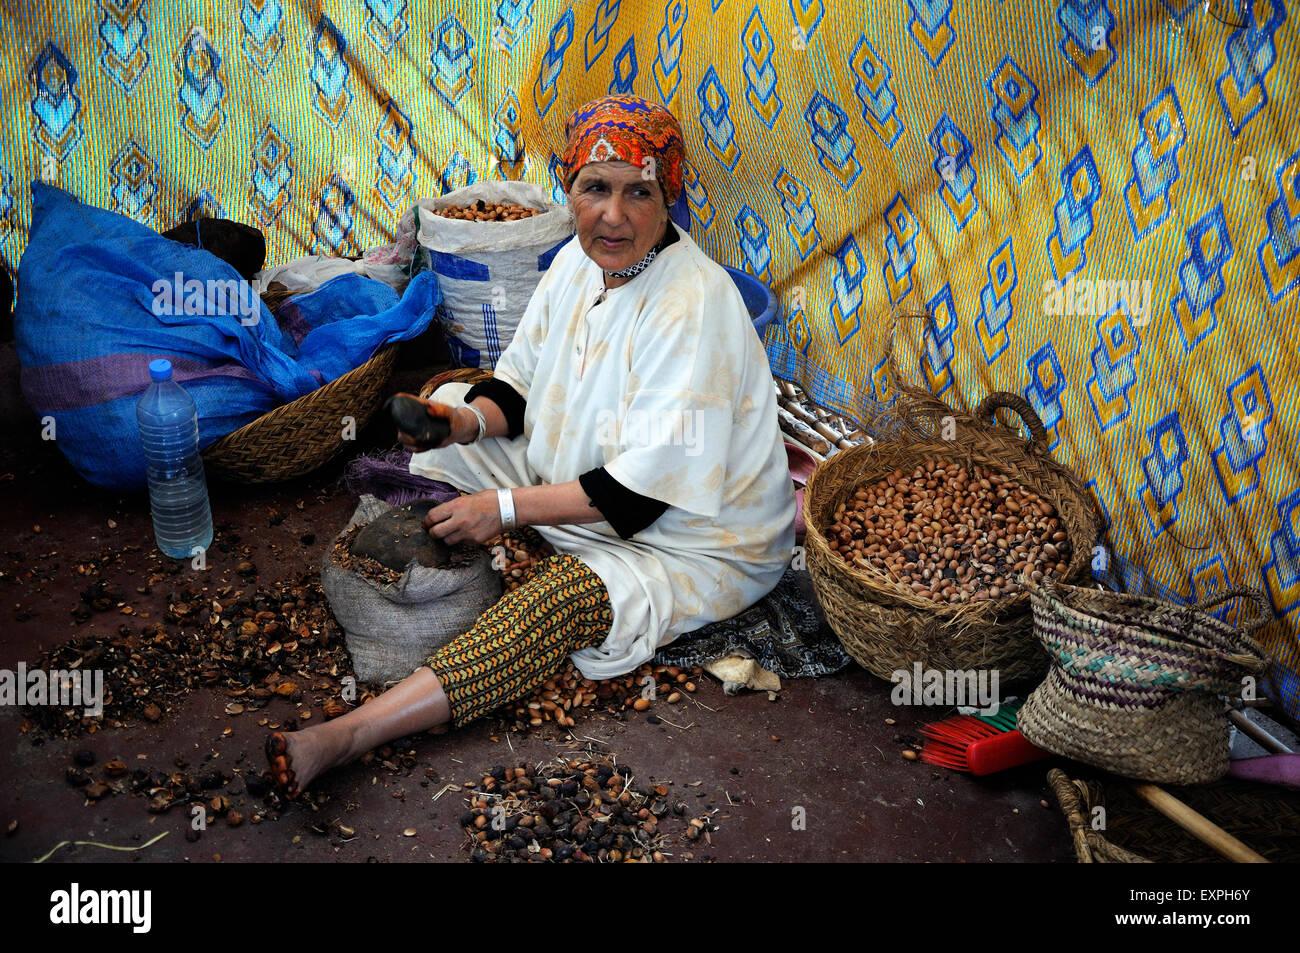 berber woman stockfotos berber woman bilder alamy. Black Bedroom Furniture Sets. Home Design Ideas